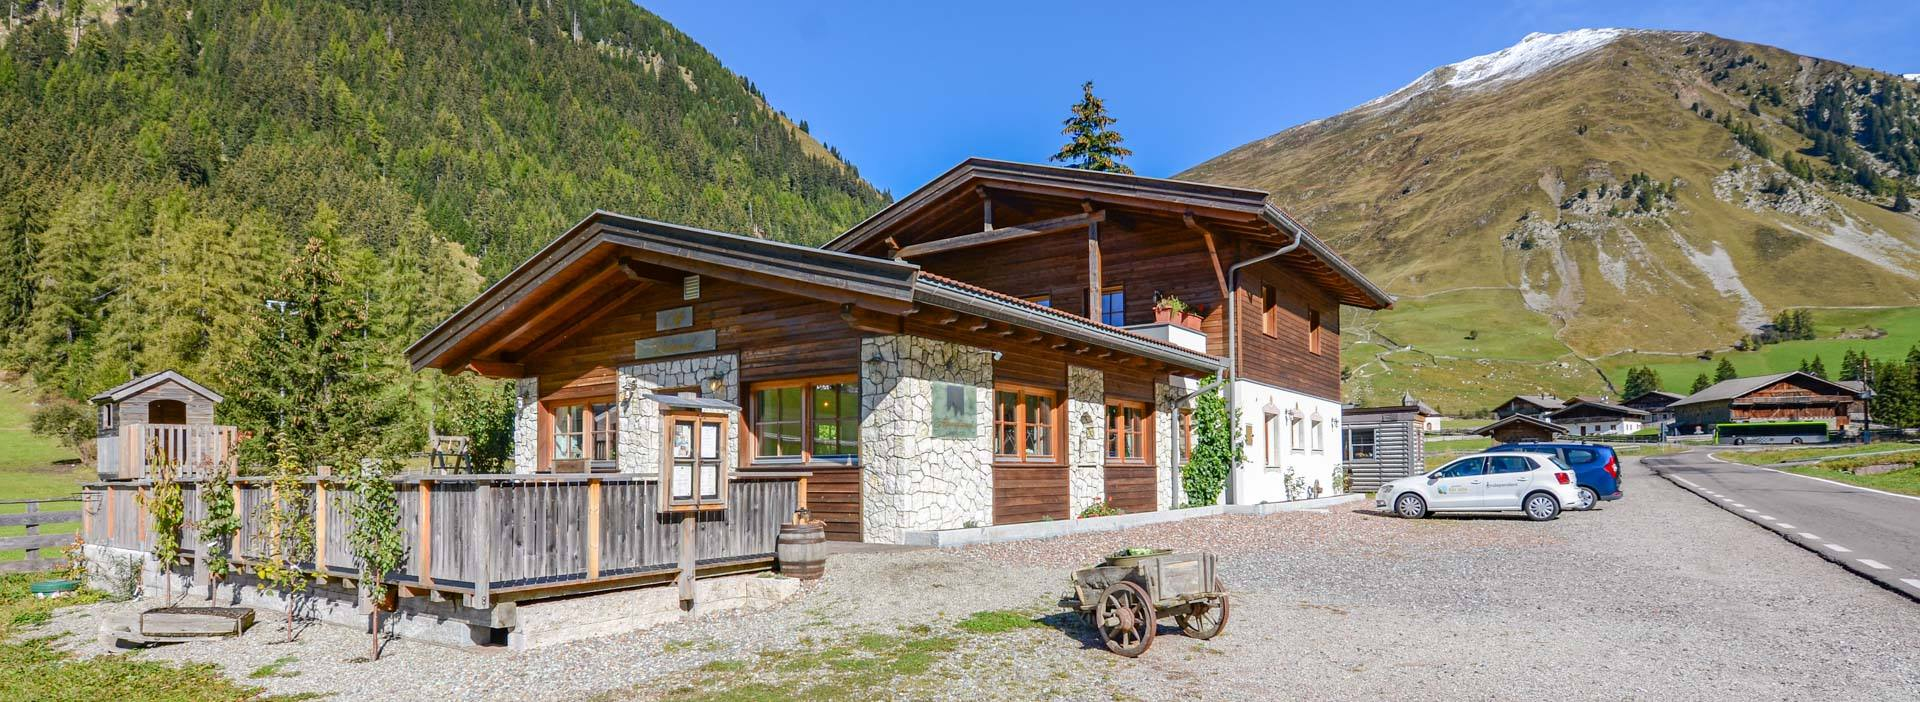 Alpenrestaurant Elisabeth